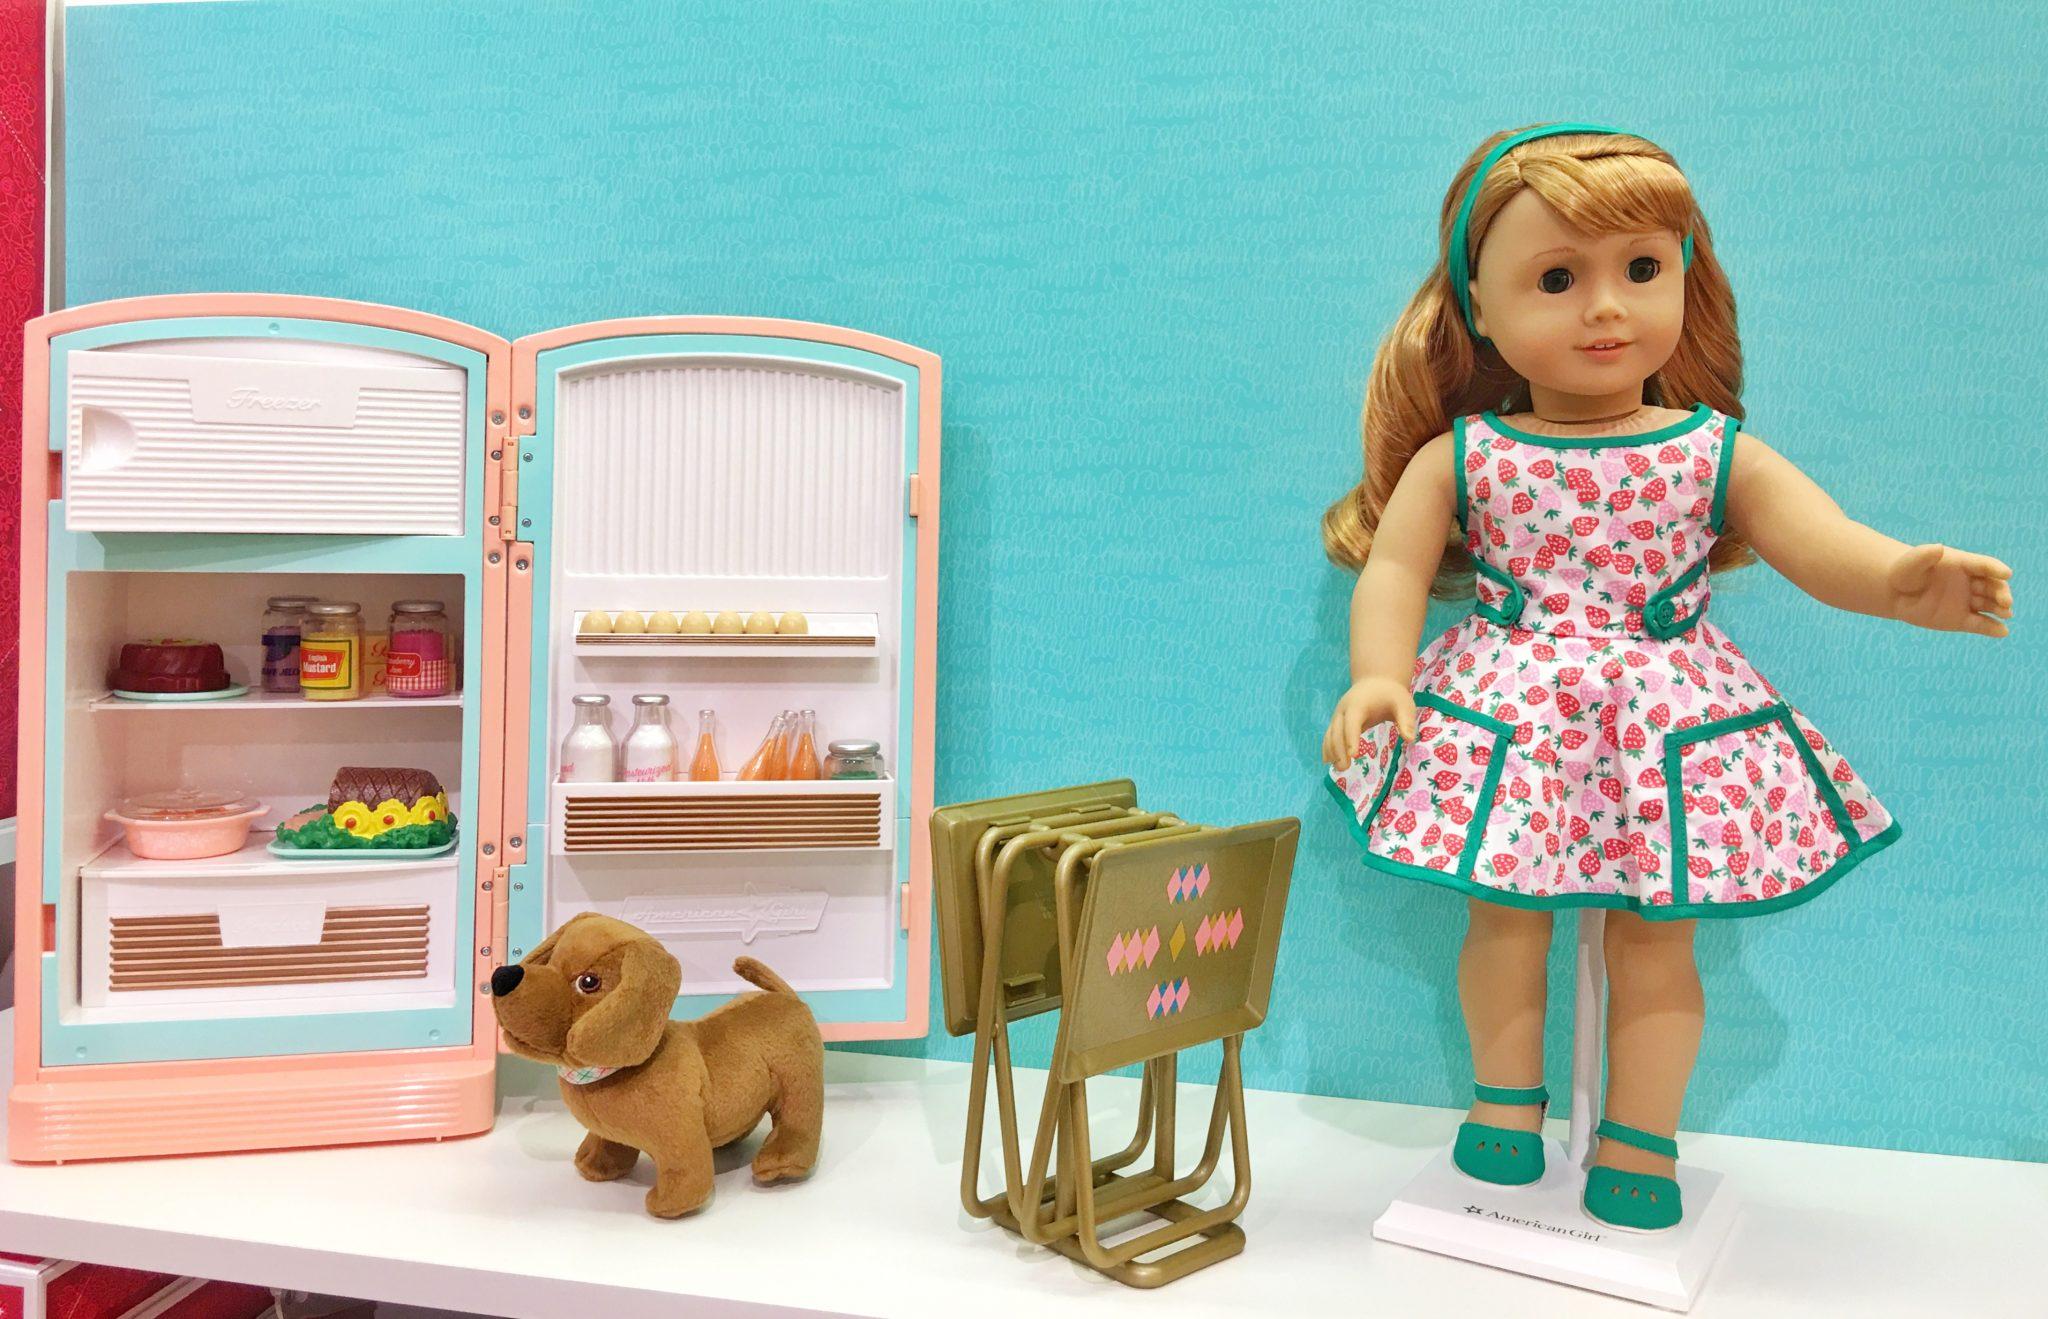 American Girl at Washington Square Mall - REALLY INTO THIS